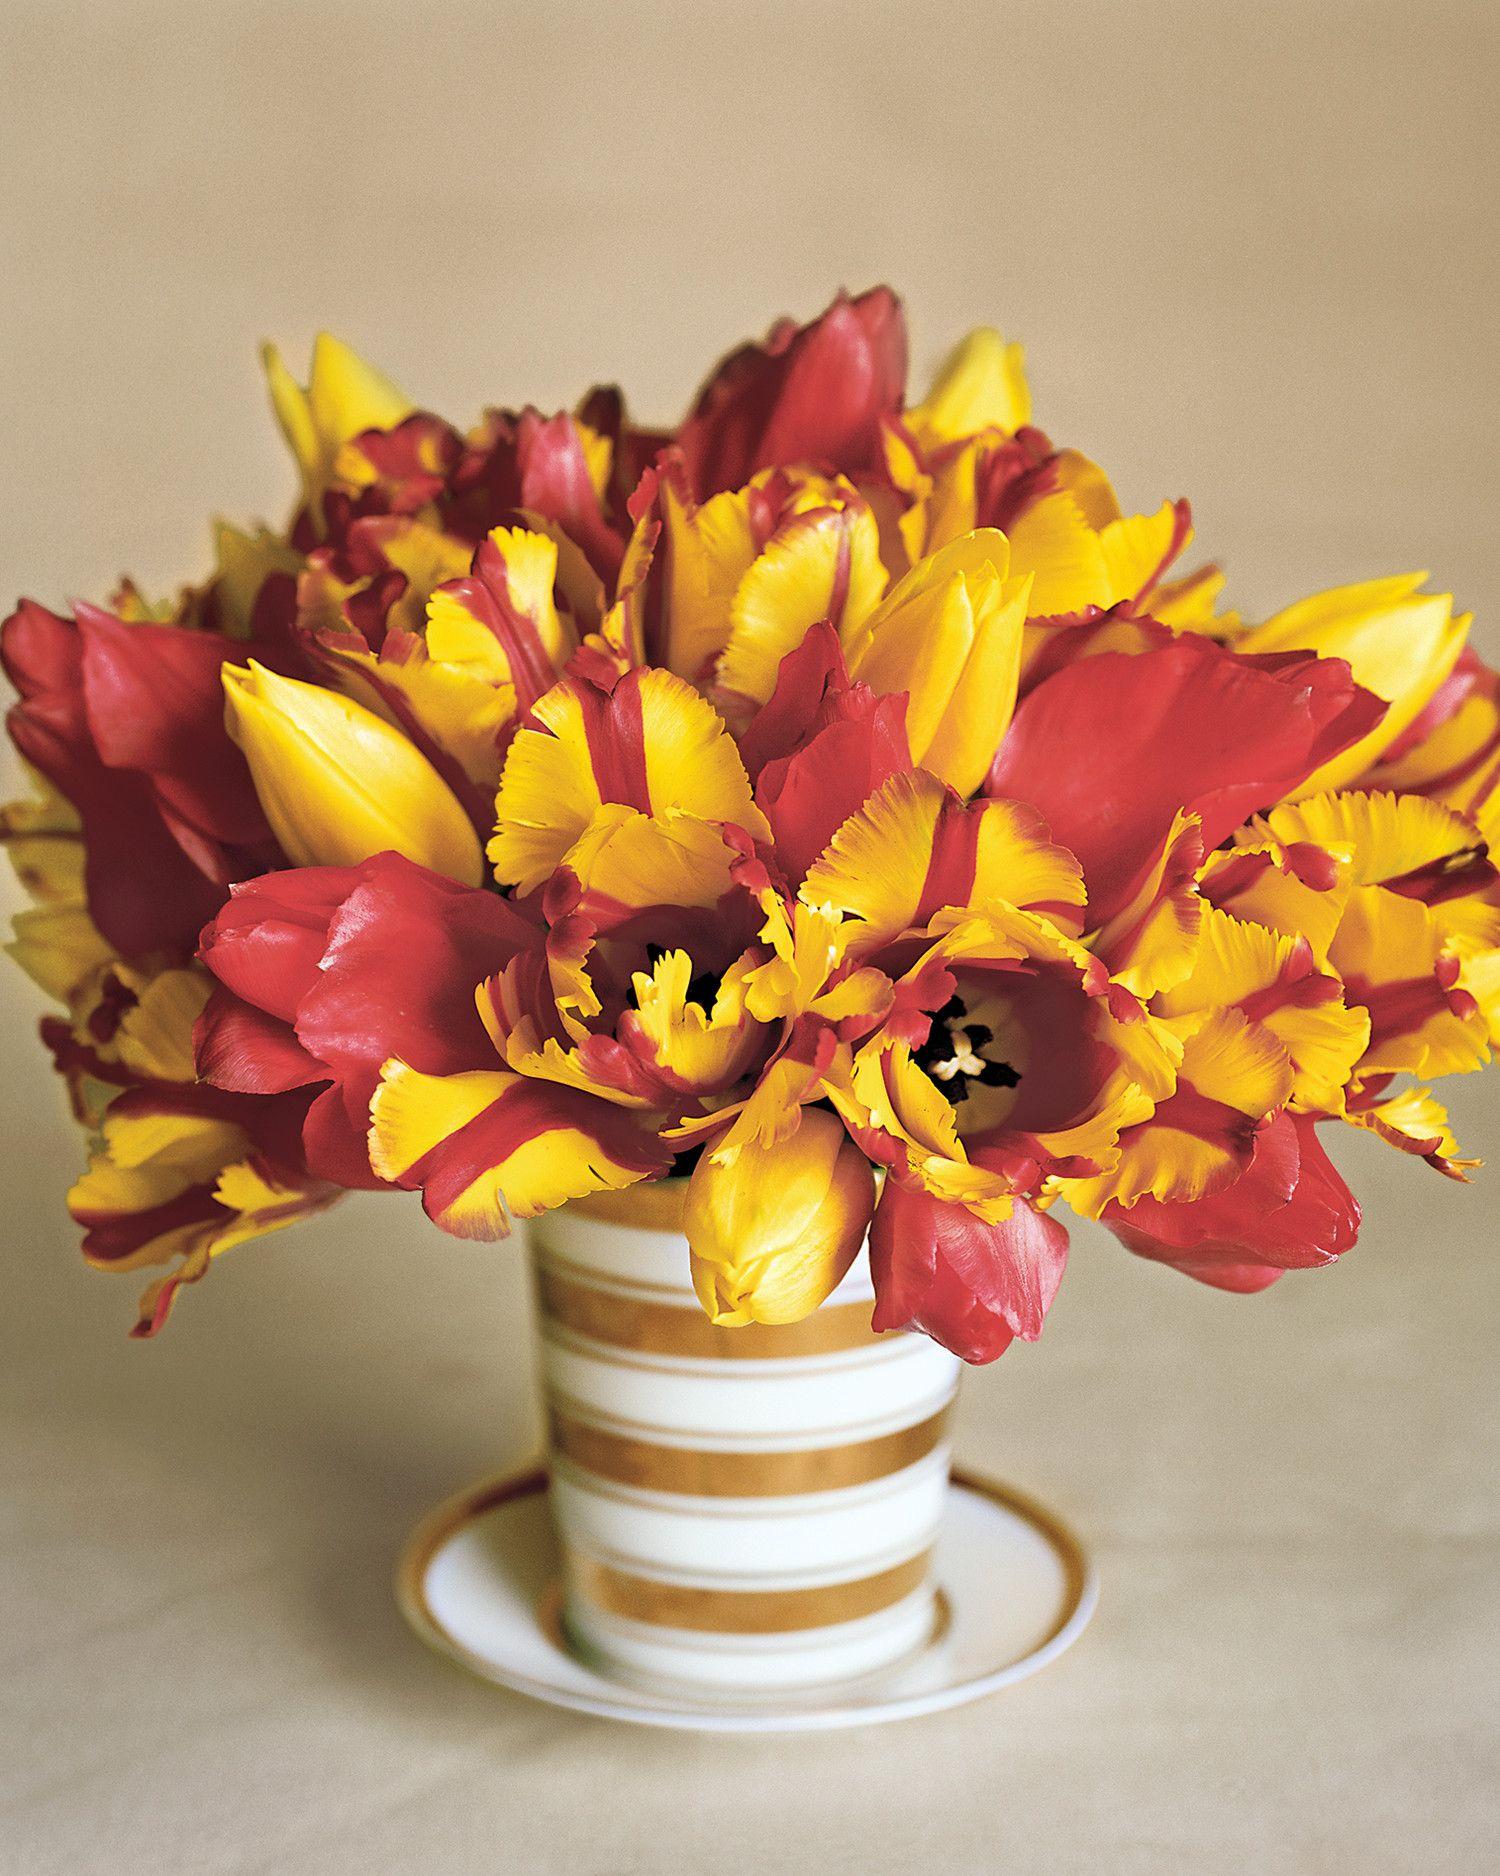 Kevin\'s Flower-Arranging Tips | Spring flowers, Flower and Gardens